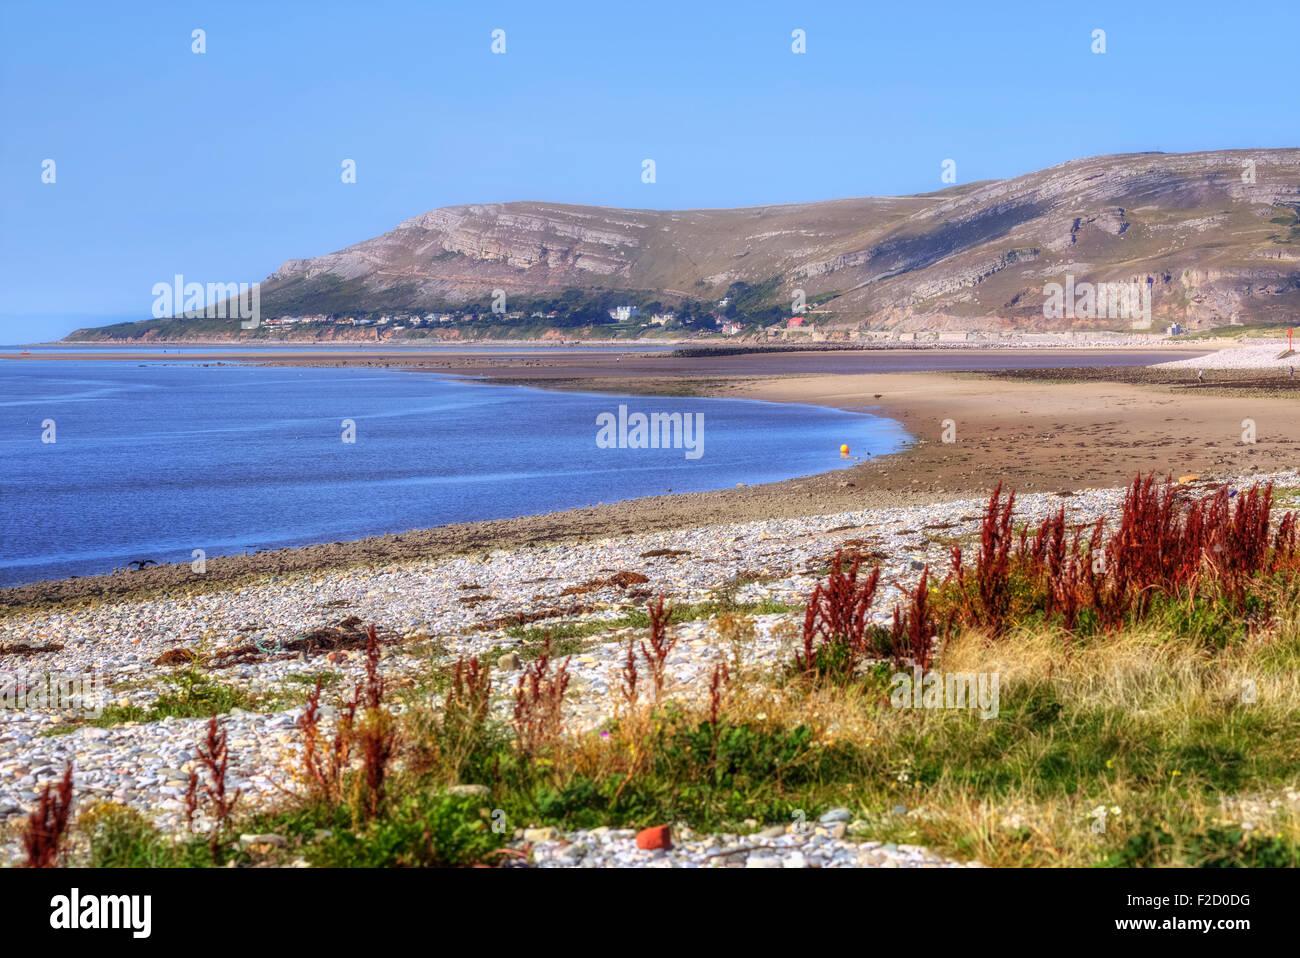 Llandudno, North Wales, United Kingdom - Stock Image